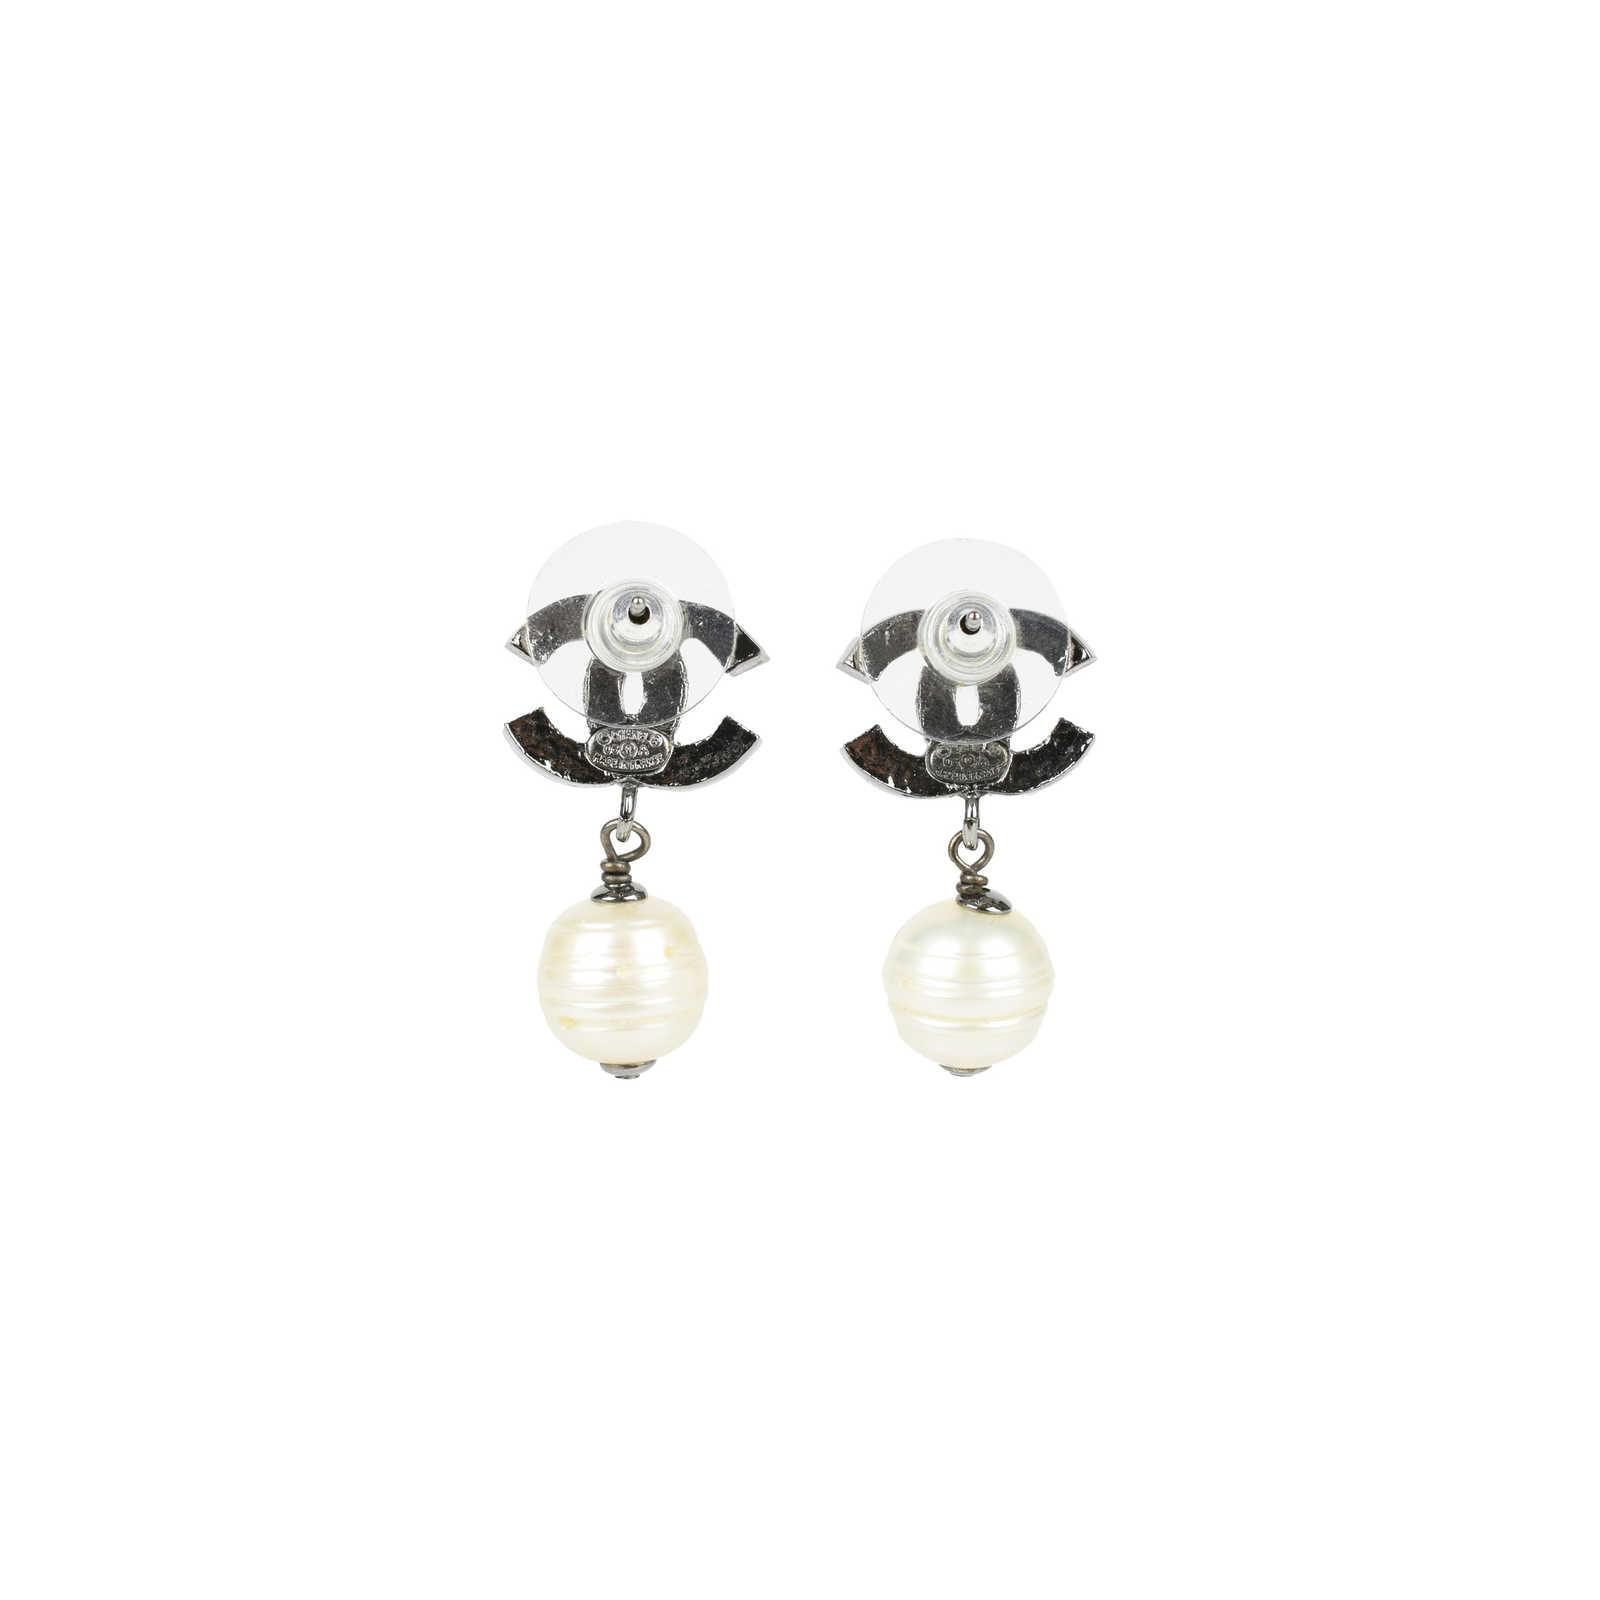 Chanel Cc Pearl Drop Earrings Metallic Thumbnail 2